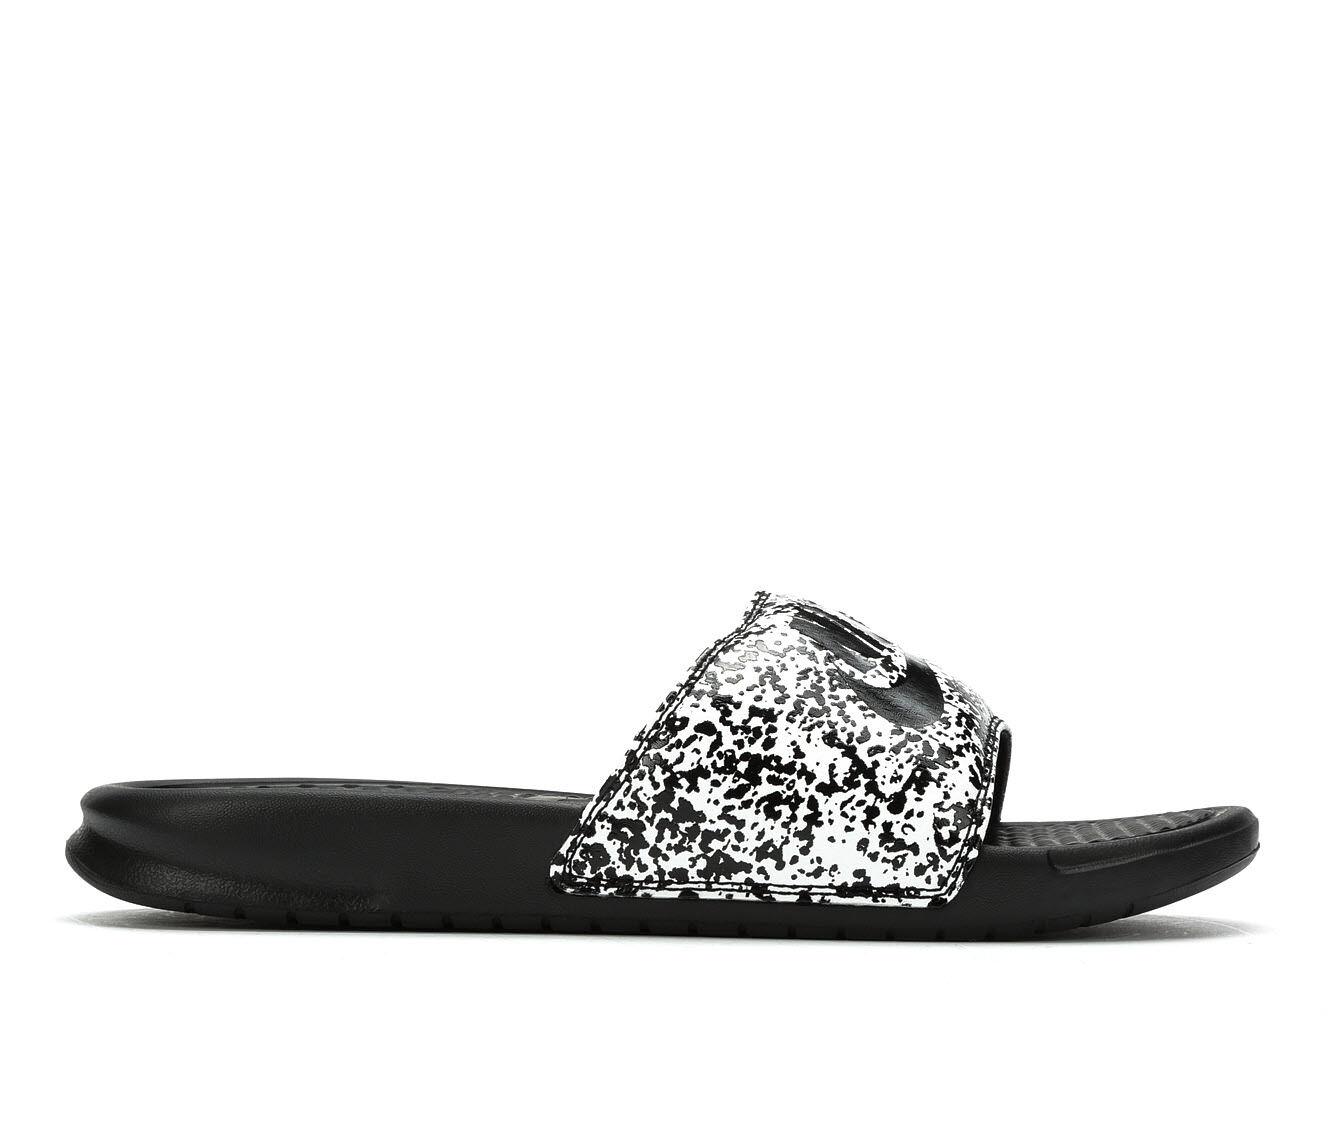 uk shoes_kd2631